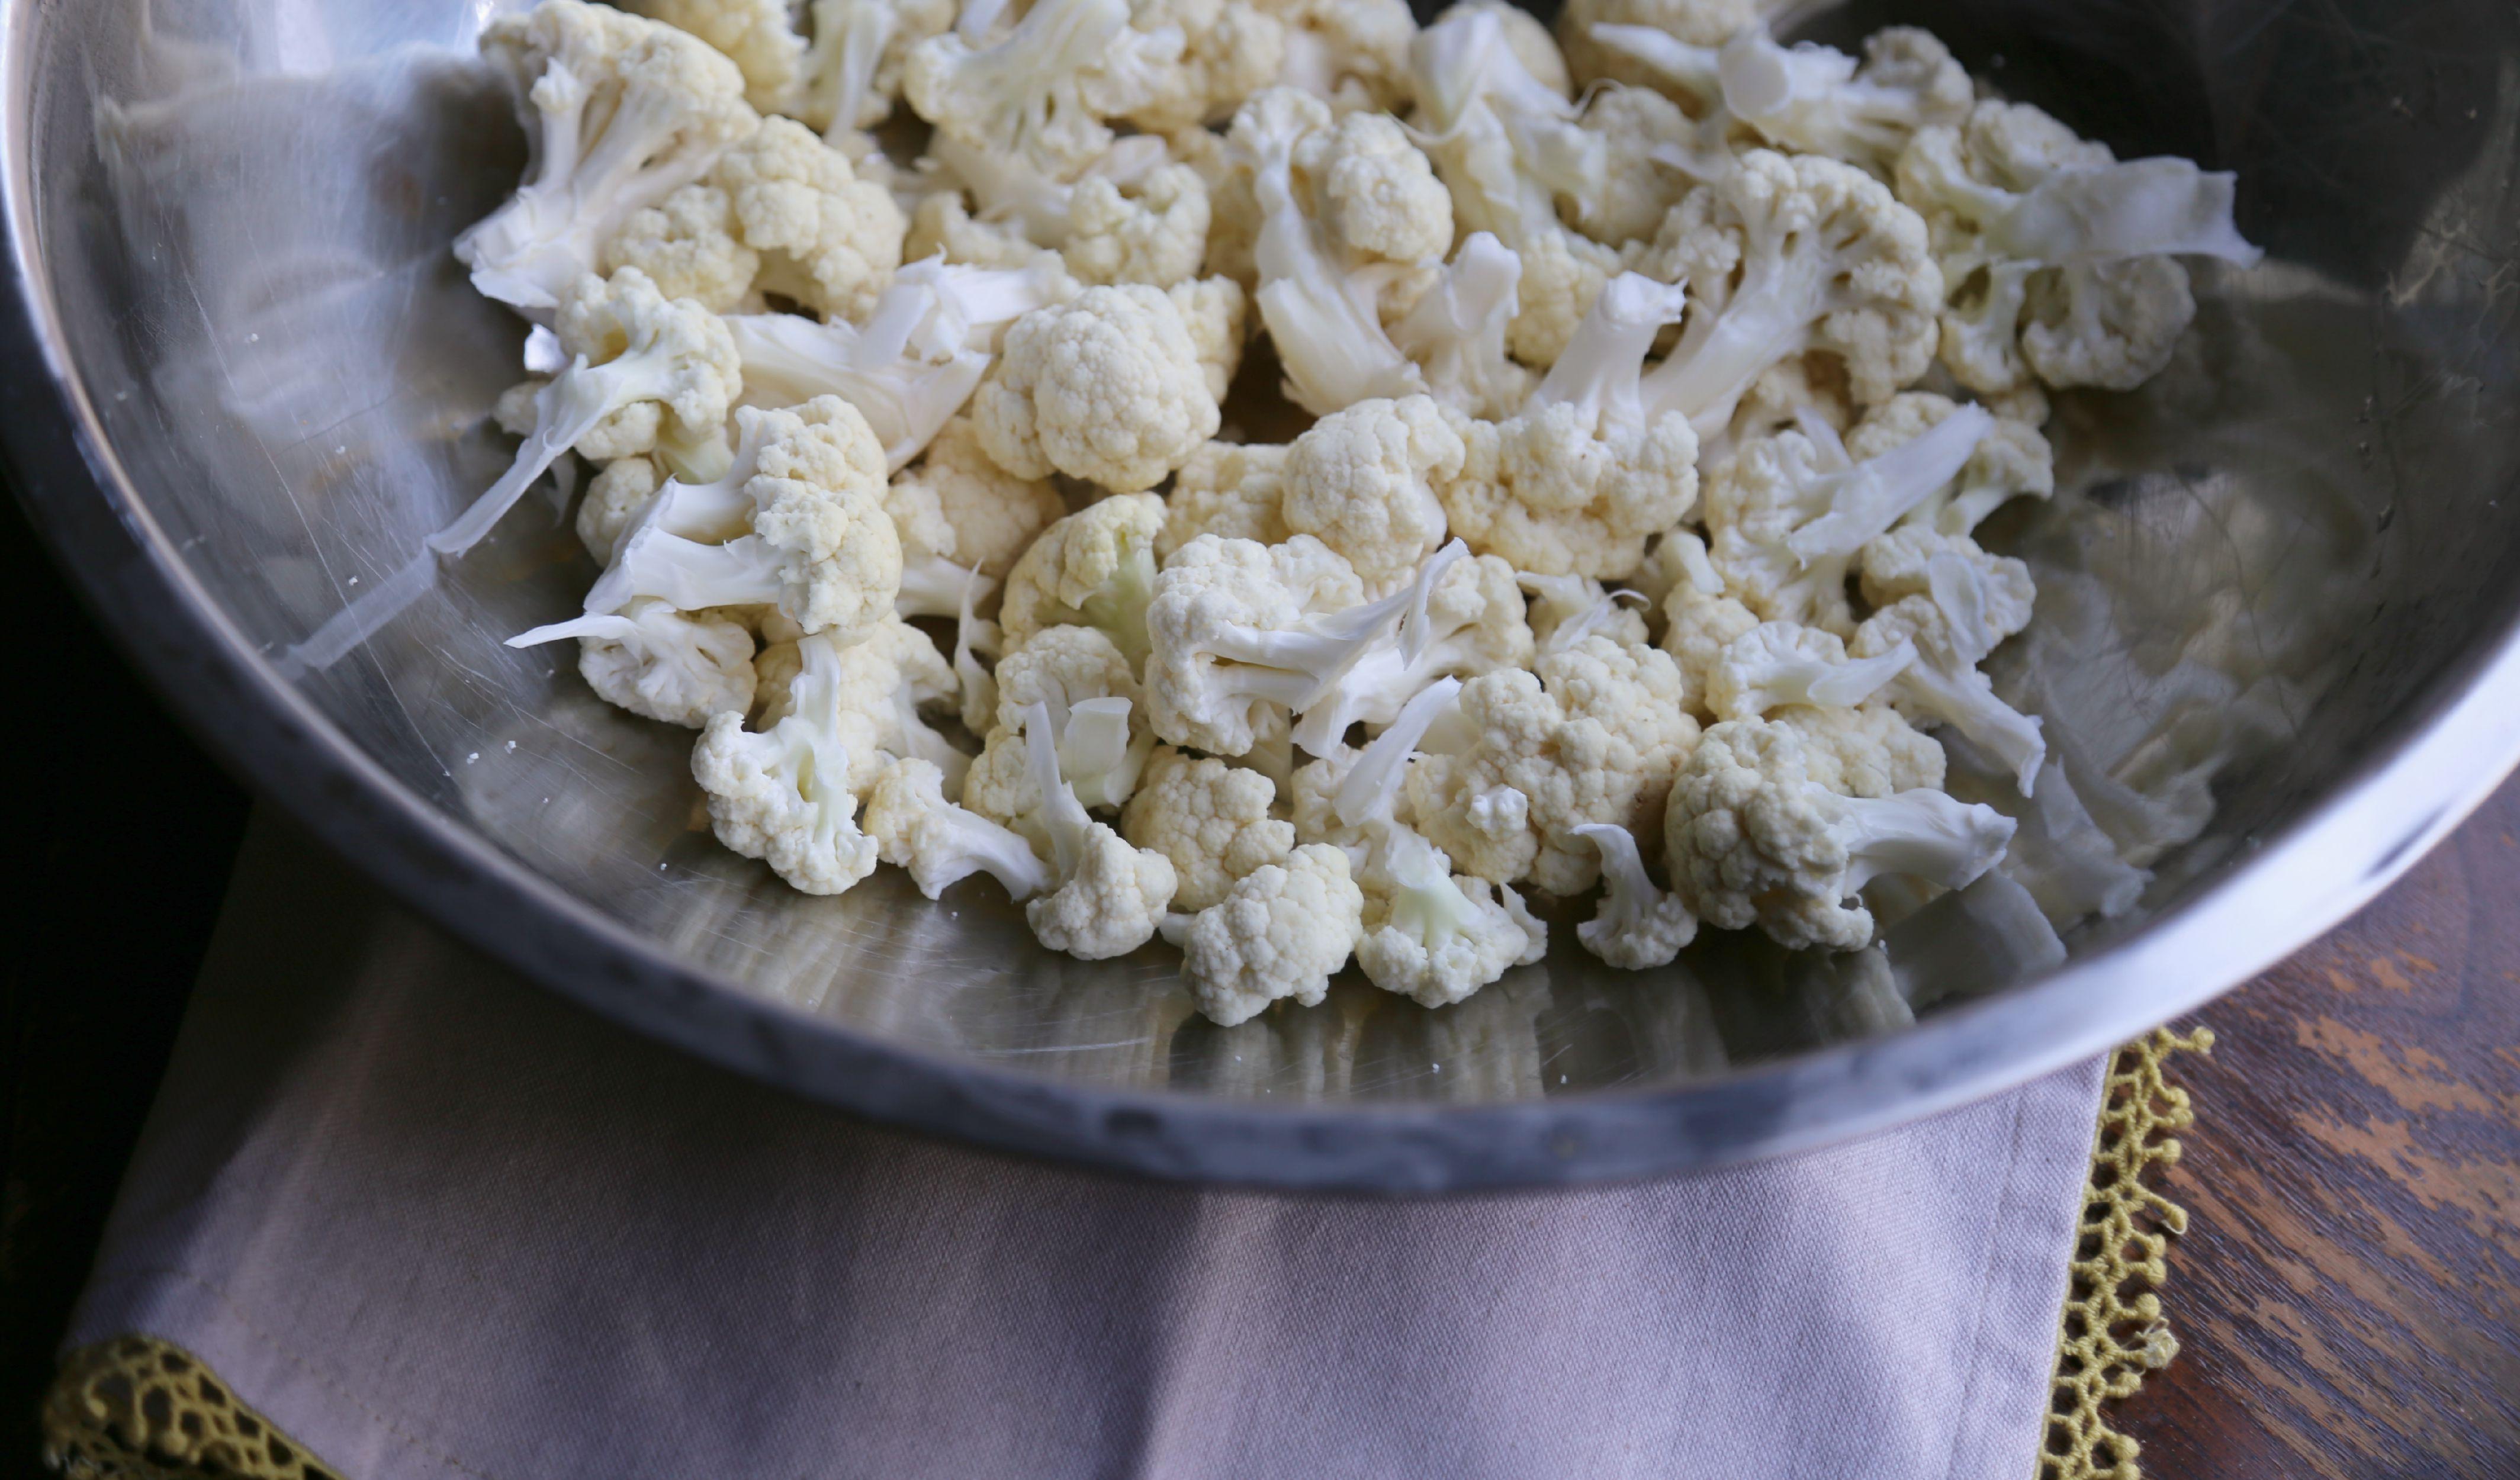 easy-cauliflower-appetizer-kikkoman-vianneyrodriguez-sweetlifebake